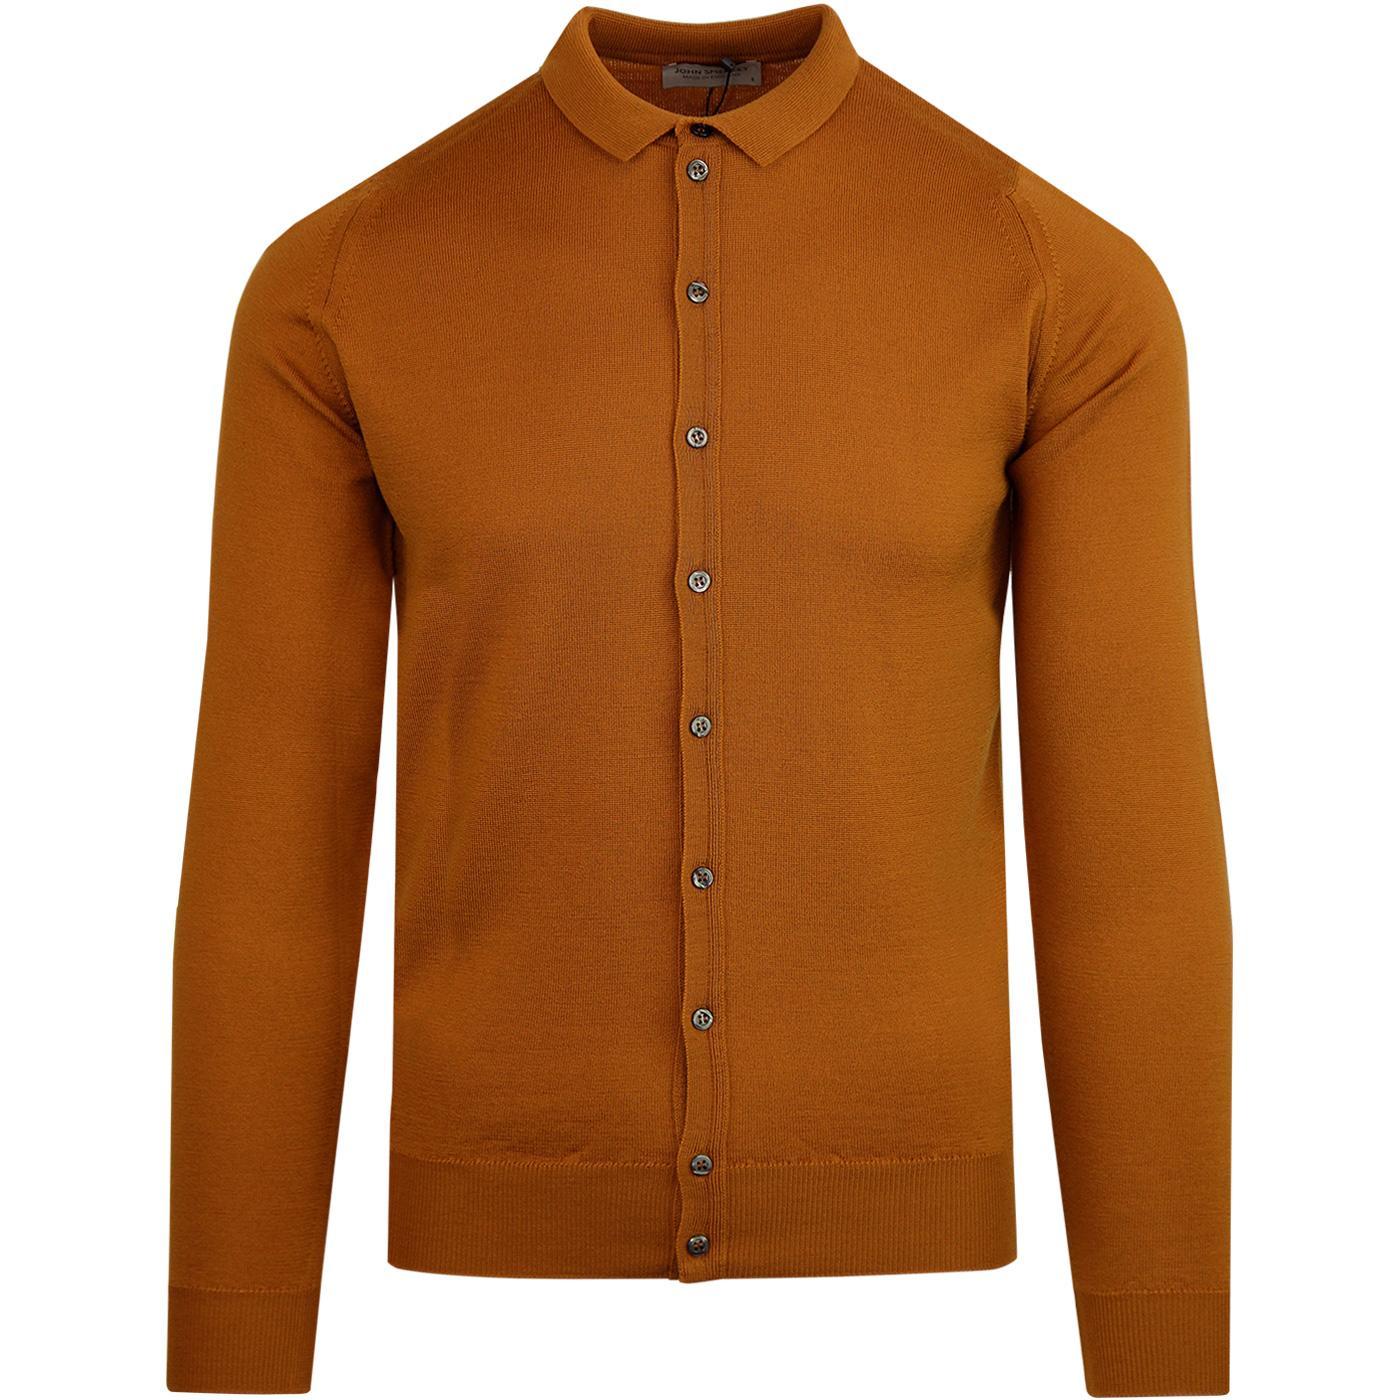 Parwish JOHN SMEDLEY Made in England Shirt BRONZE